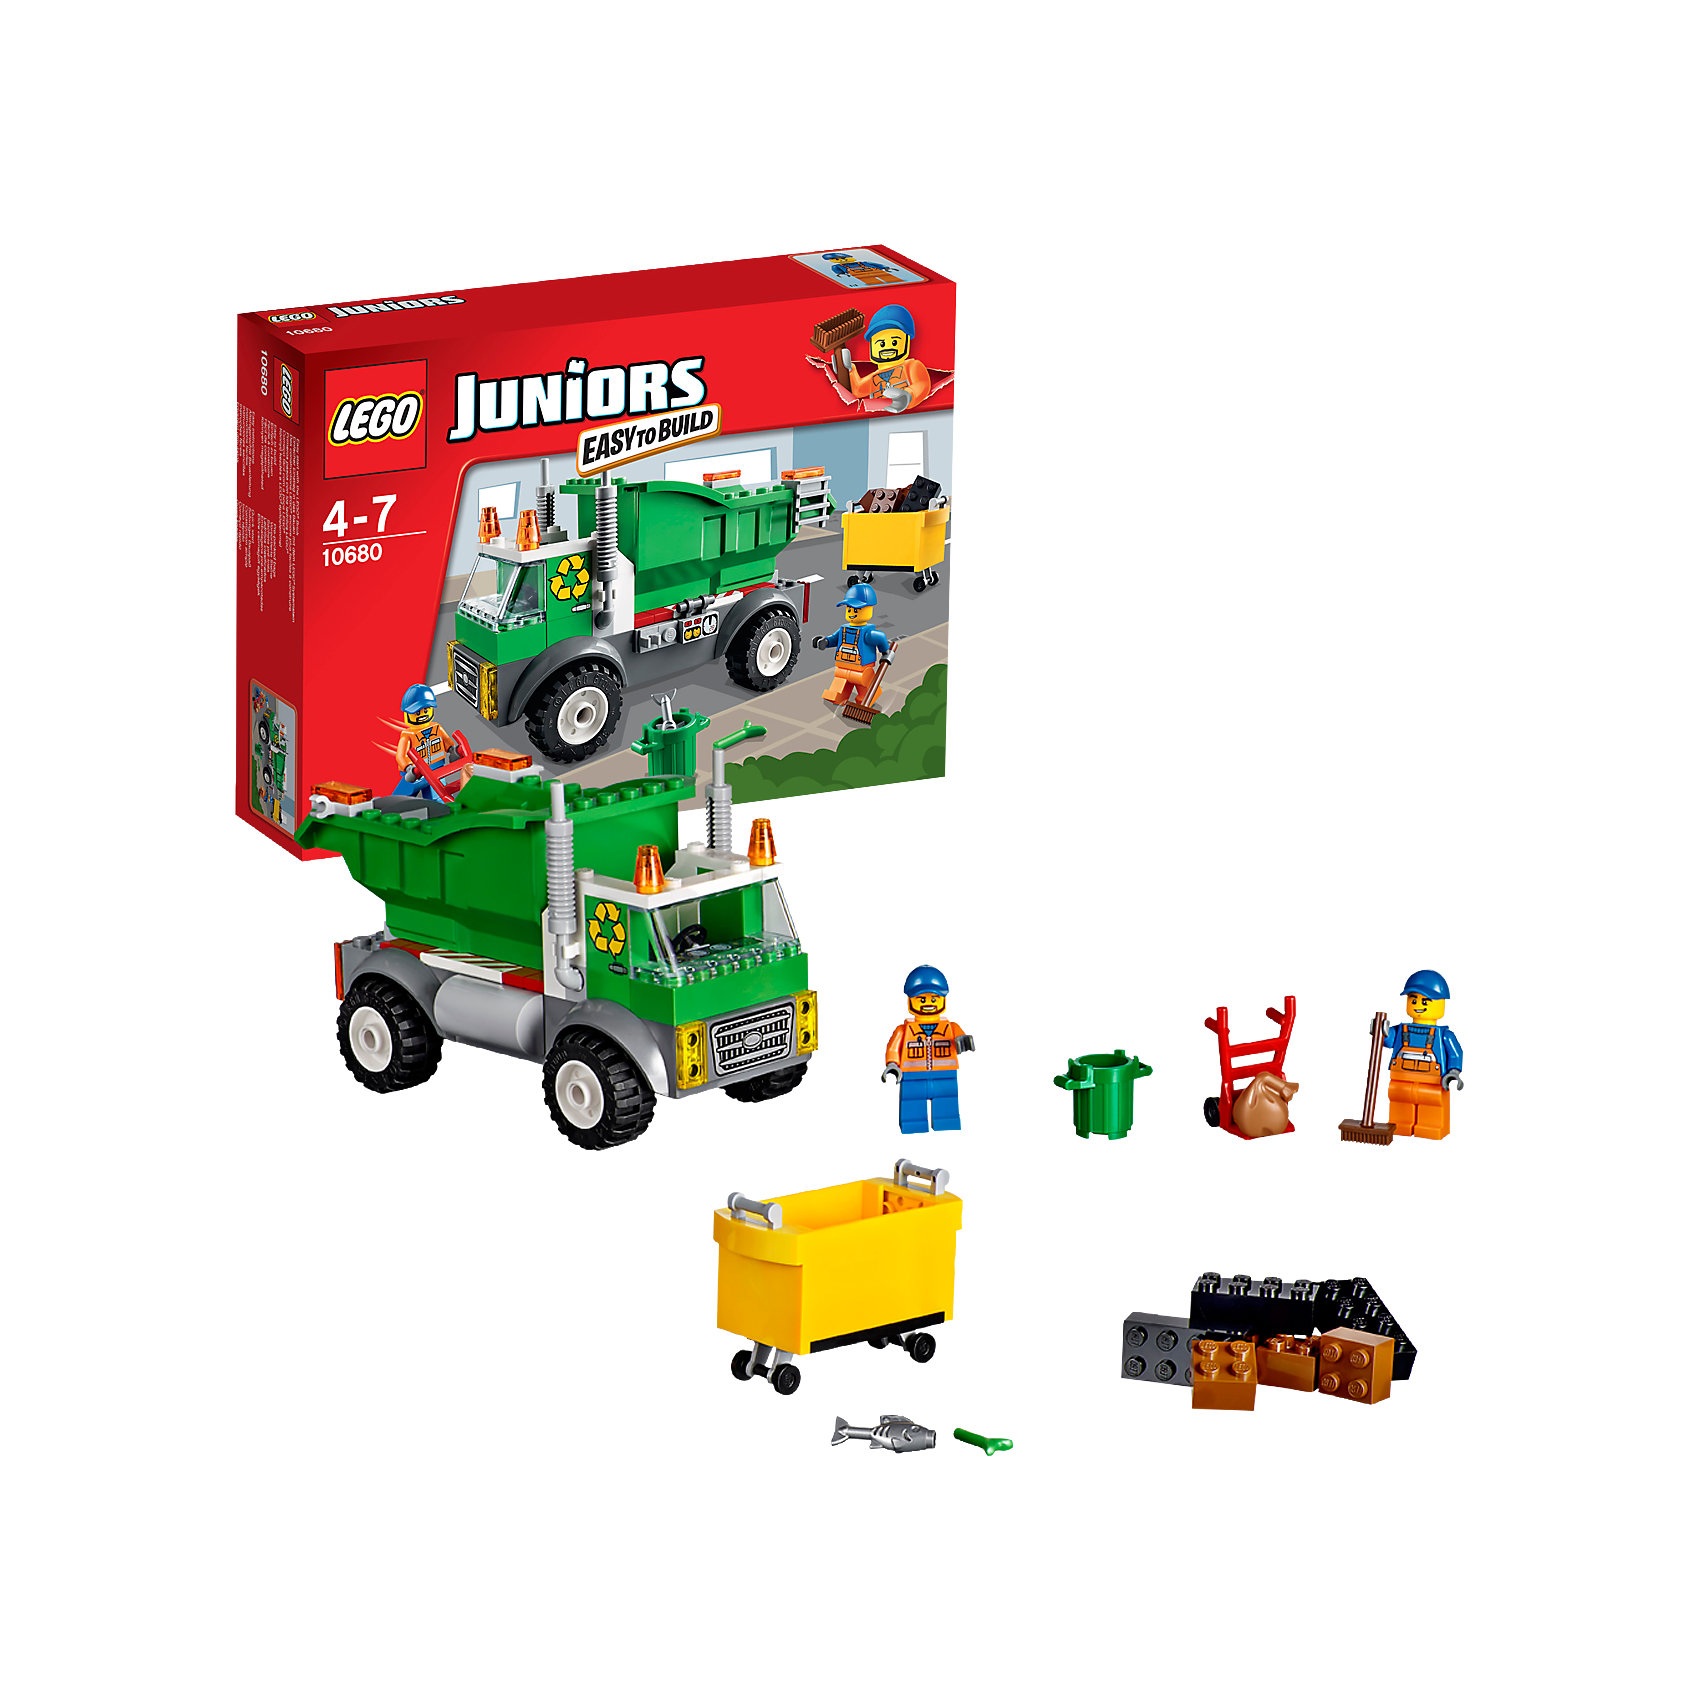 LEGO Juniors 10680: Мусоровоз